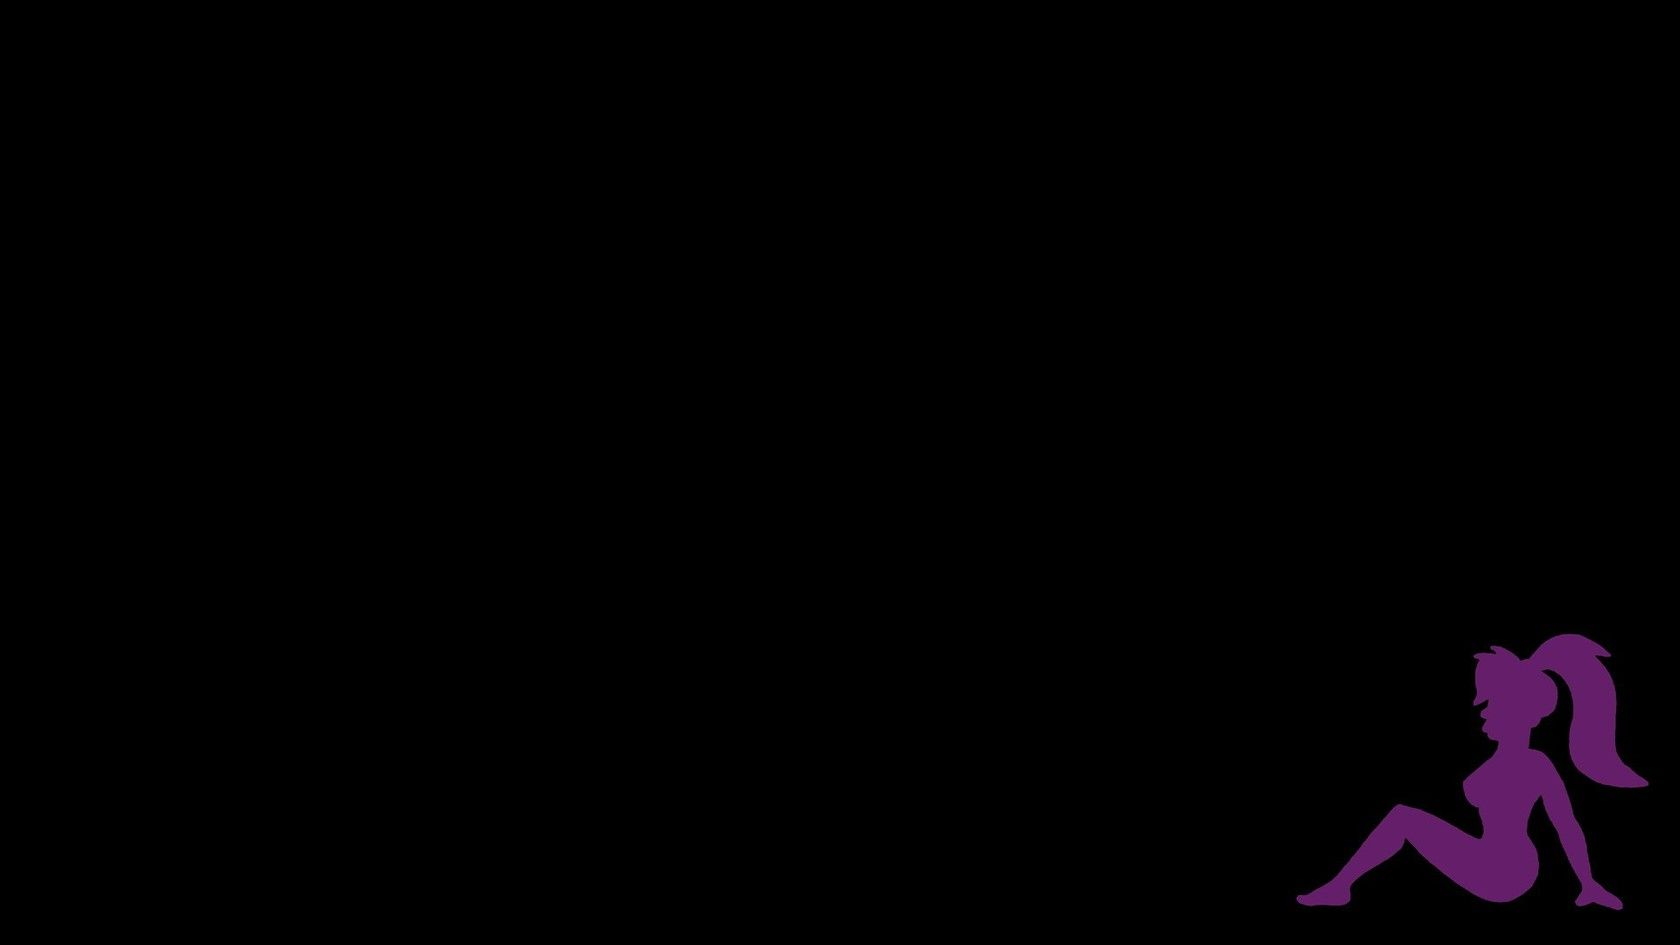 Vector Leela silhouette - Futurama WallPaper HD - http://imashon.com/vector/vector-leela-silhouette-futurama-wallpaper-hd.html